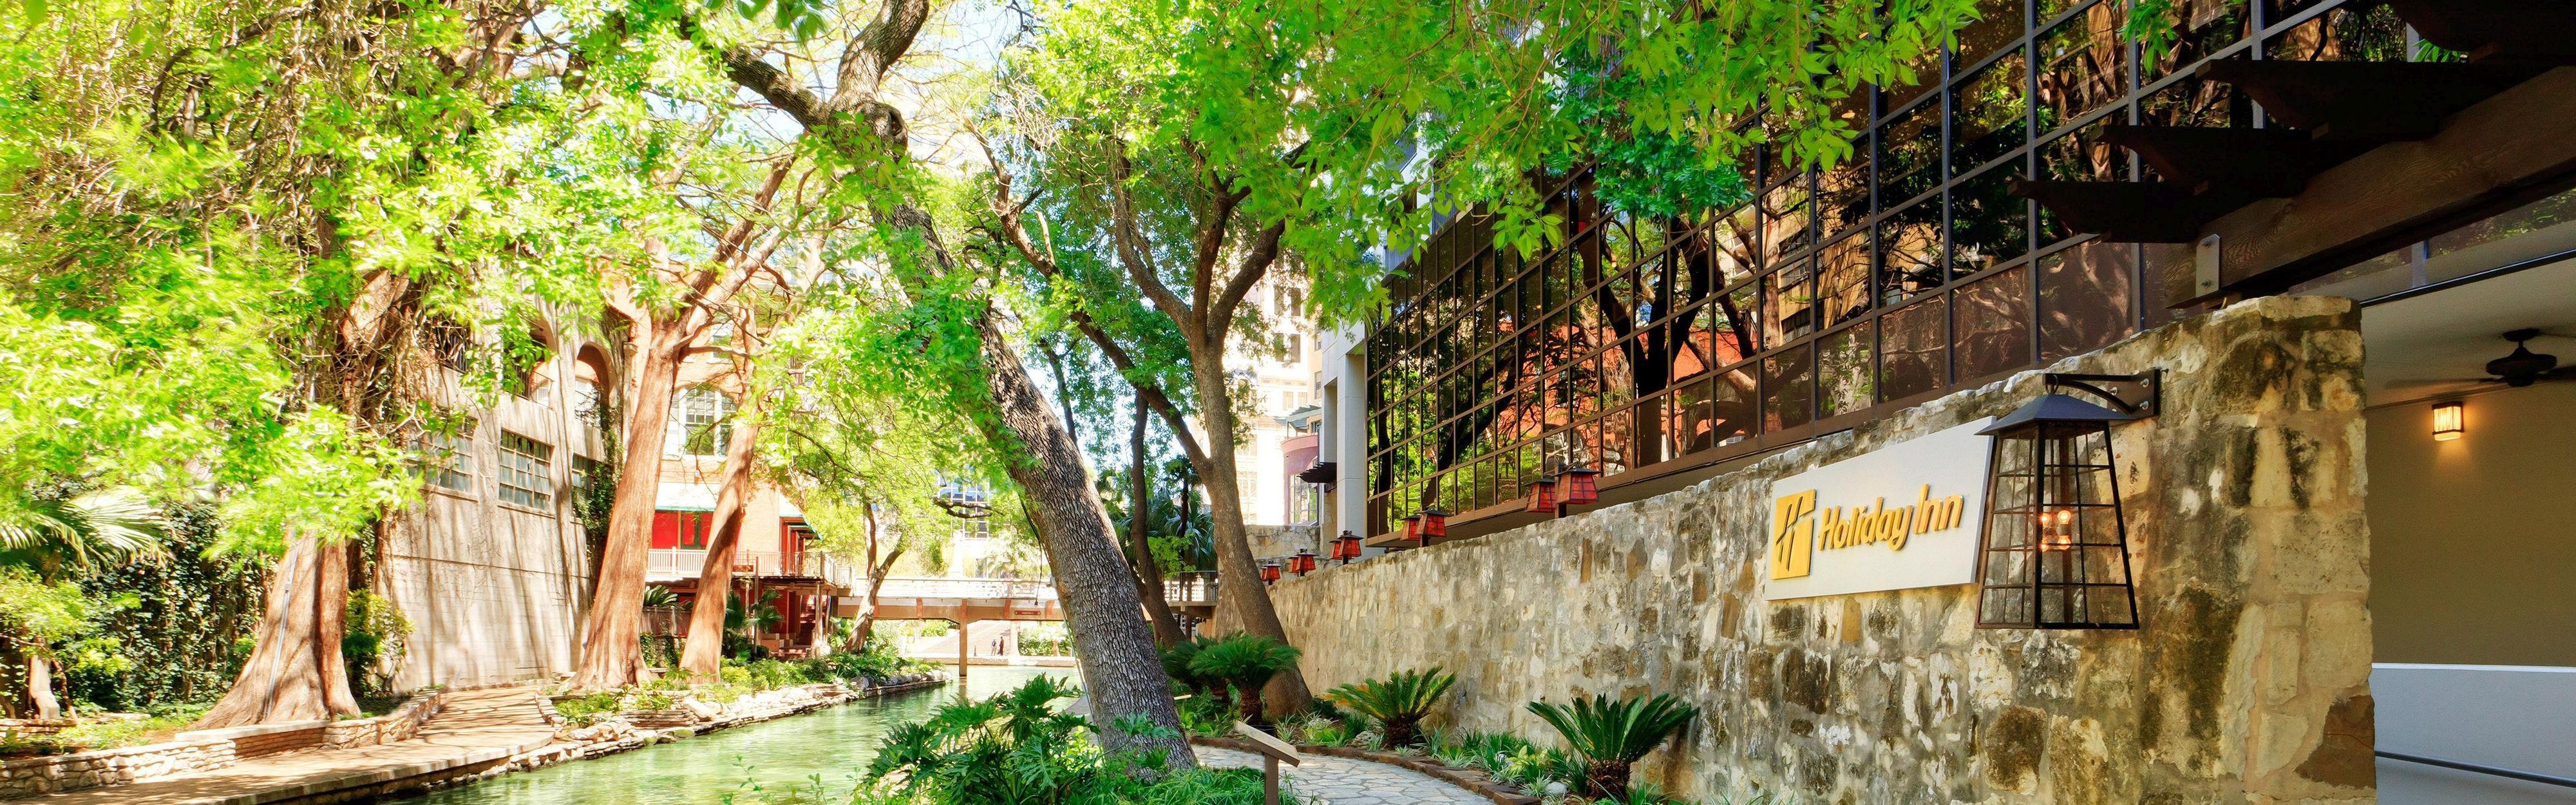 small resolution of holiday inn san antonio riverwalk